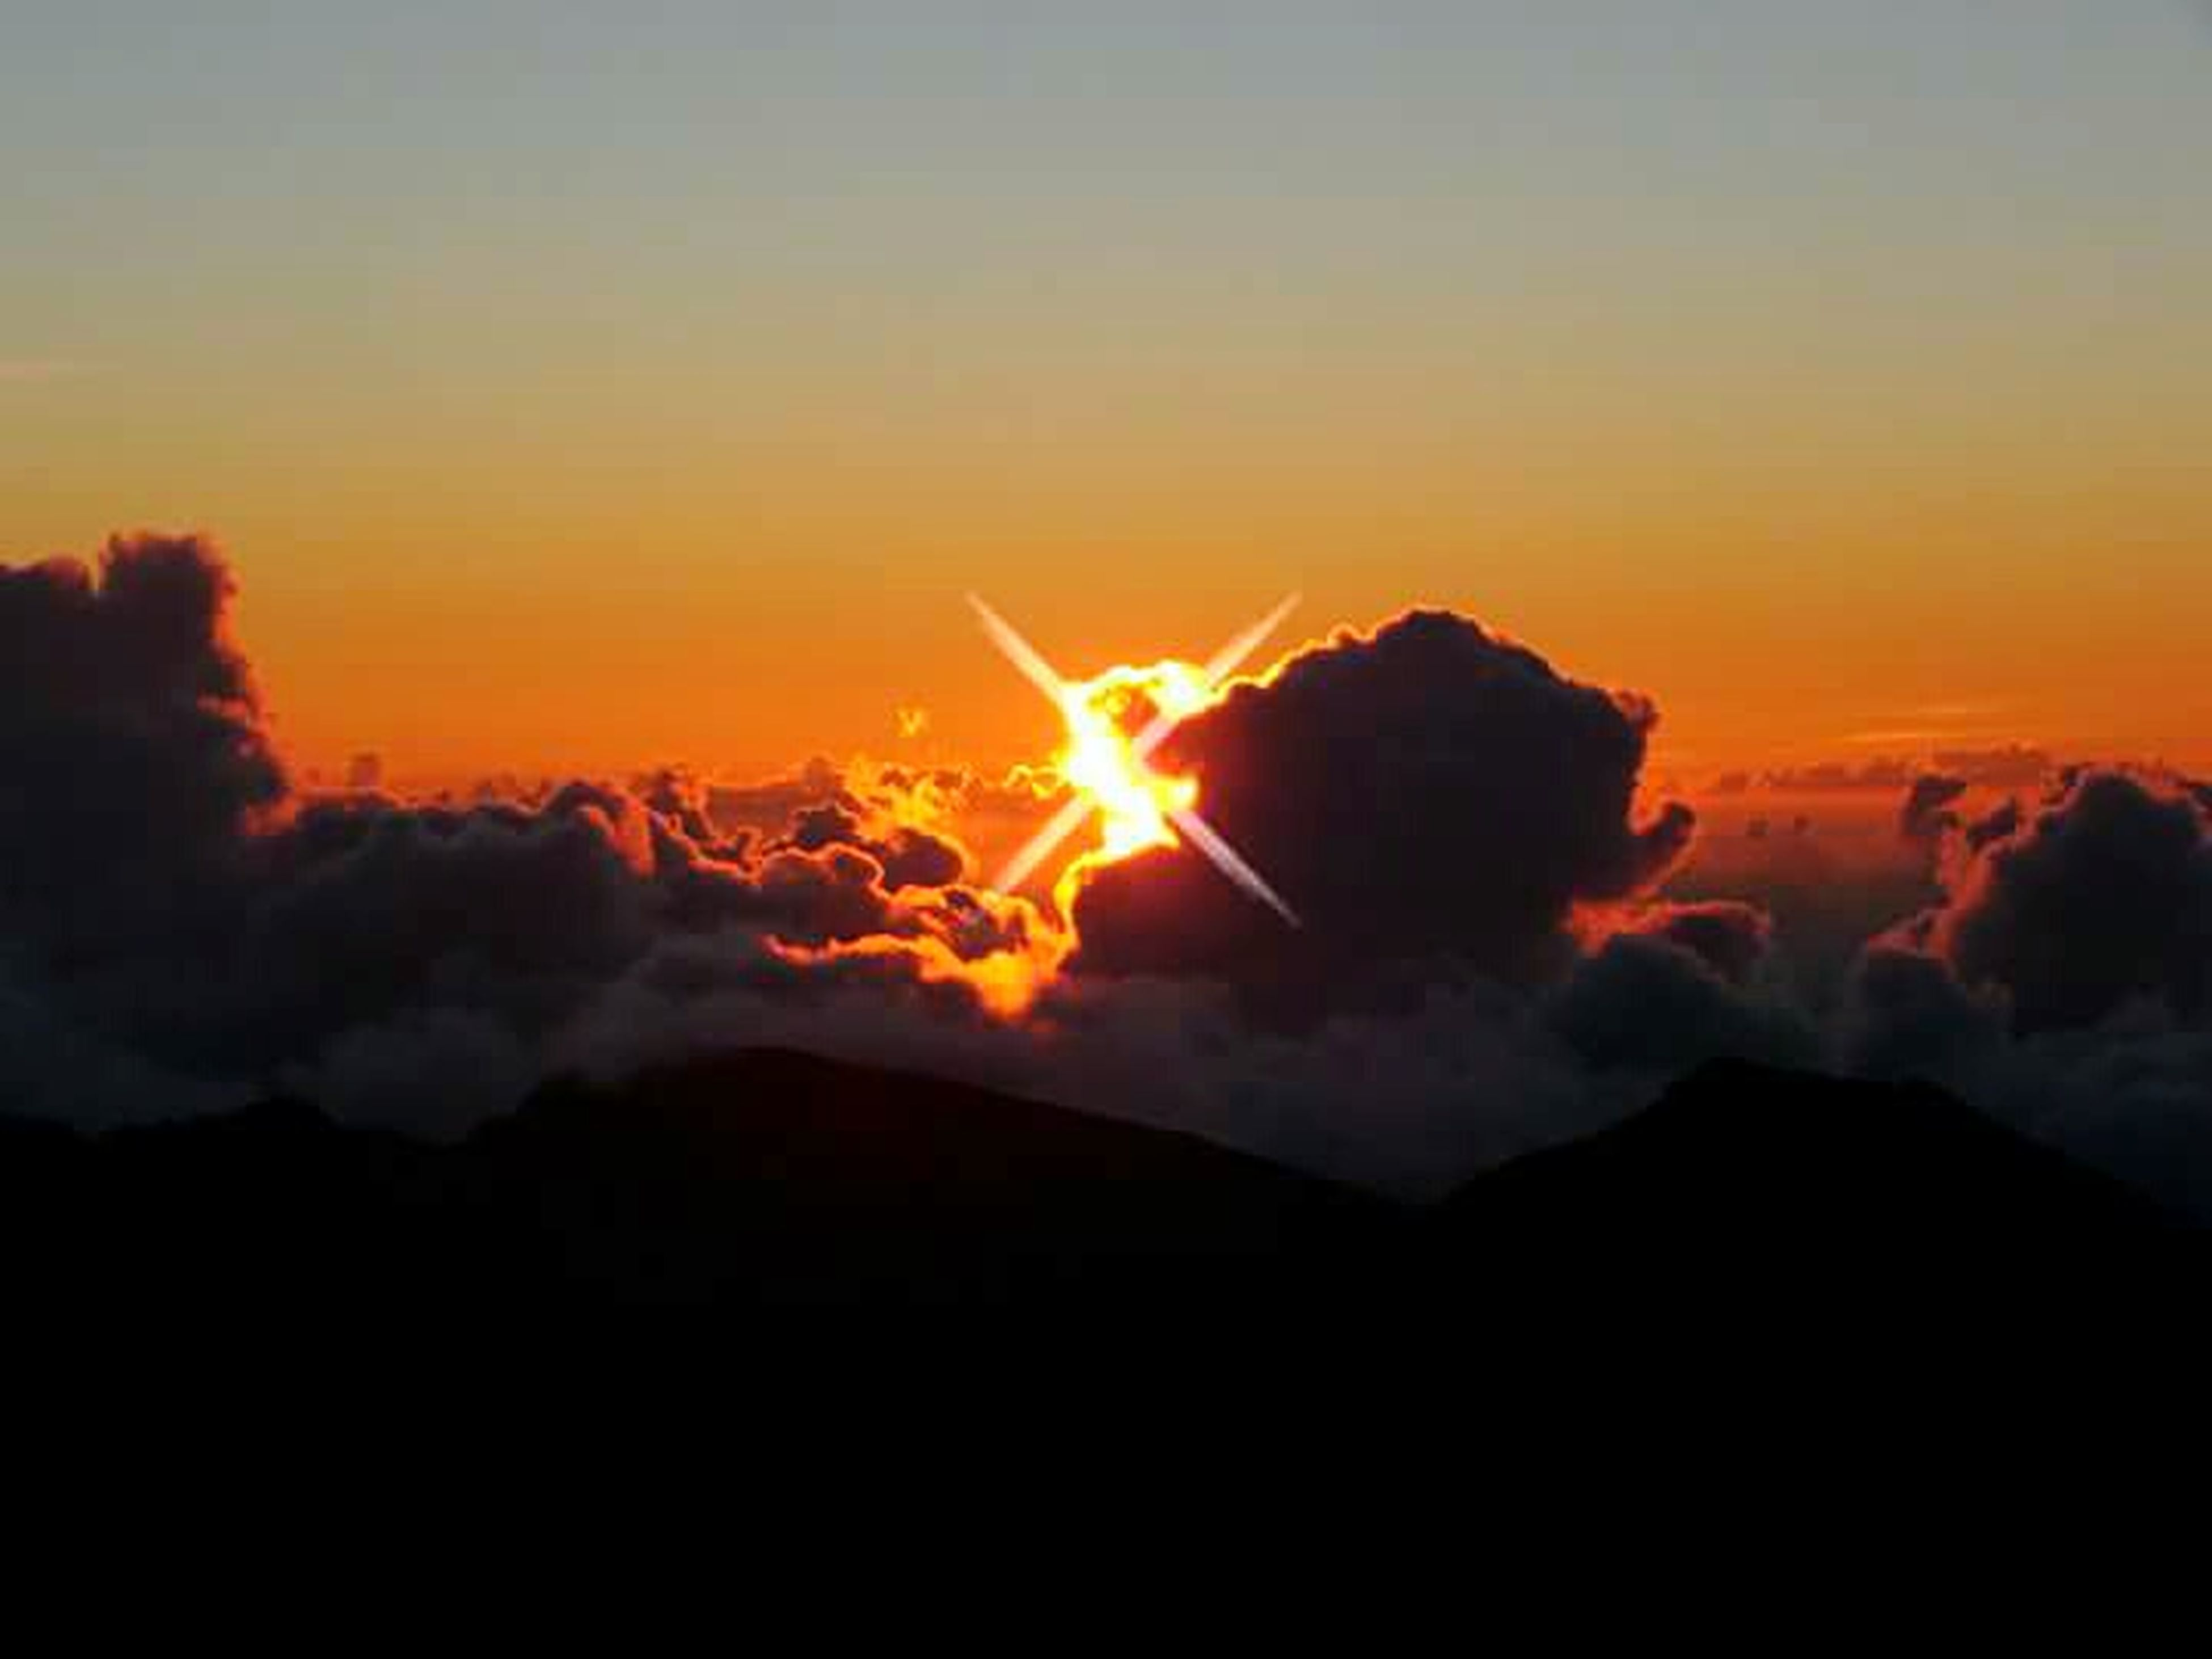 sunset, scenics, tranquil scene, mountain, beauty in nature, silhouette, orange color, tranquility, sun, sky, idyllic, nature, mountain range, copy space, landscape, majestic, sunlight, outdoors, cloud - sky, no people